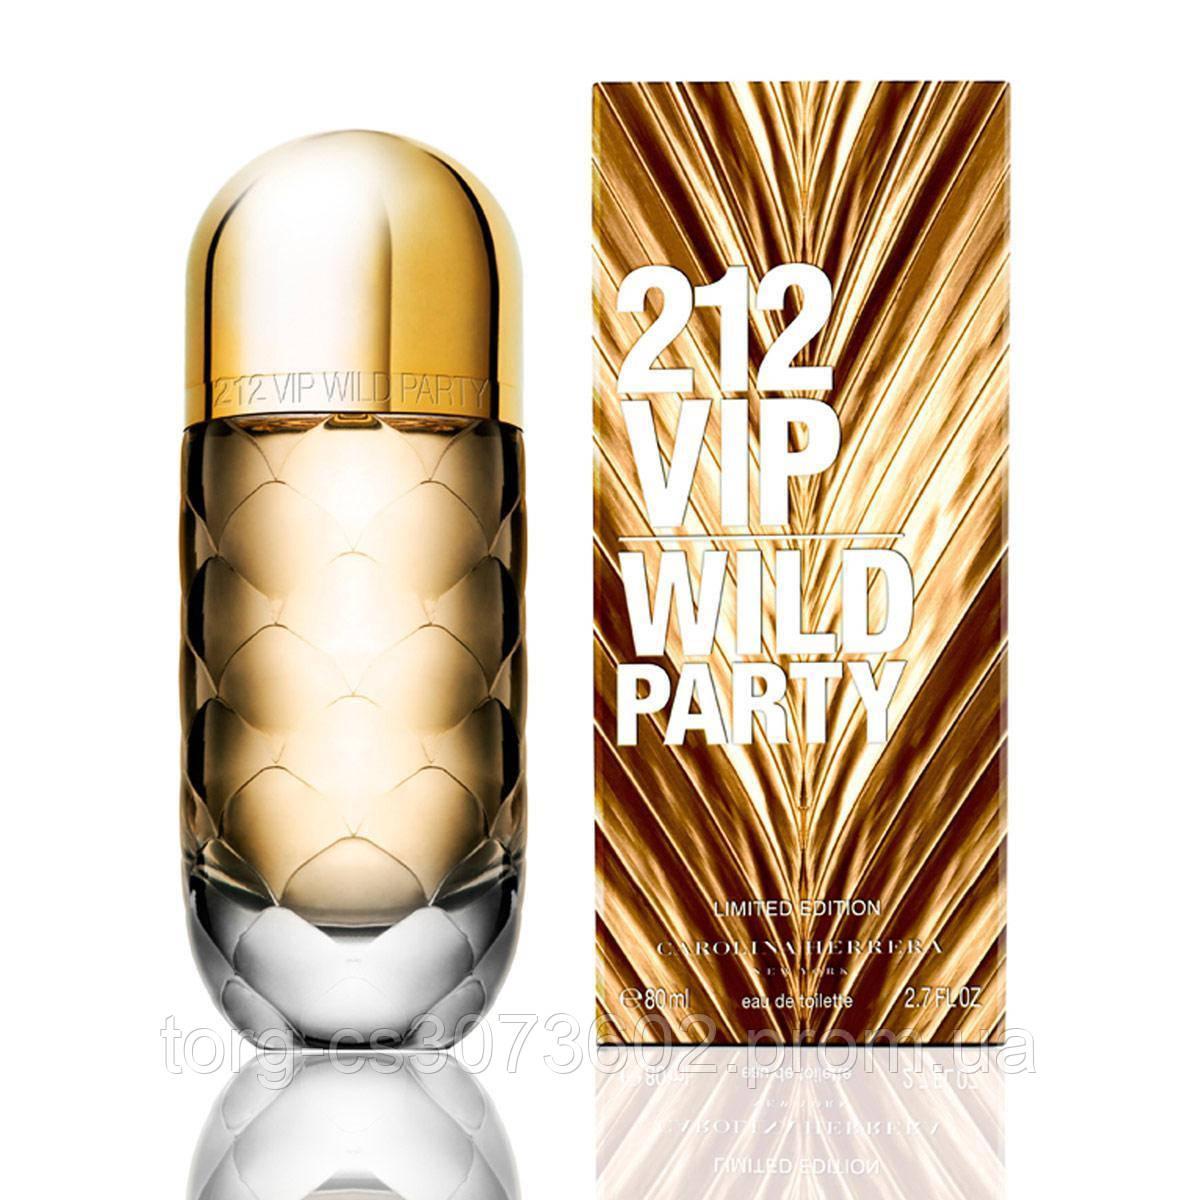 Carolina Herrera 212 VIP Wild Party, женская туалетная вода 80 мл.